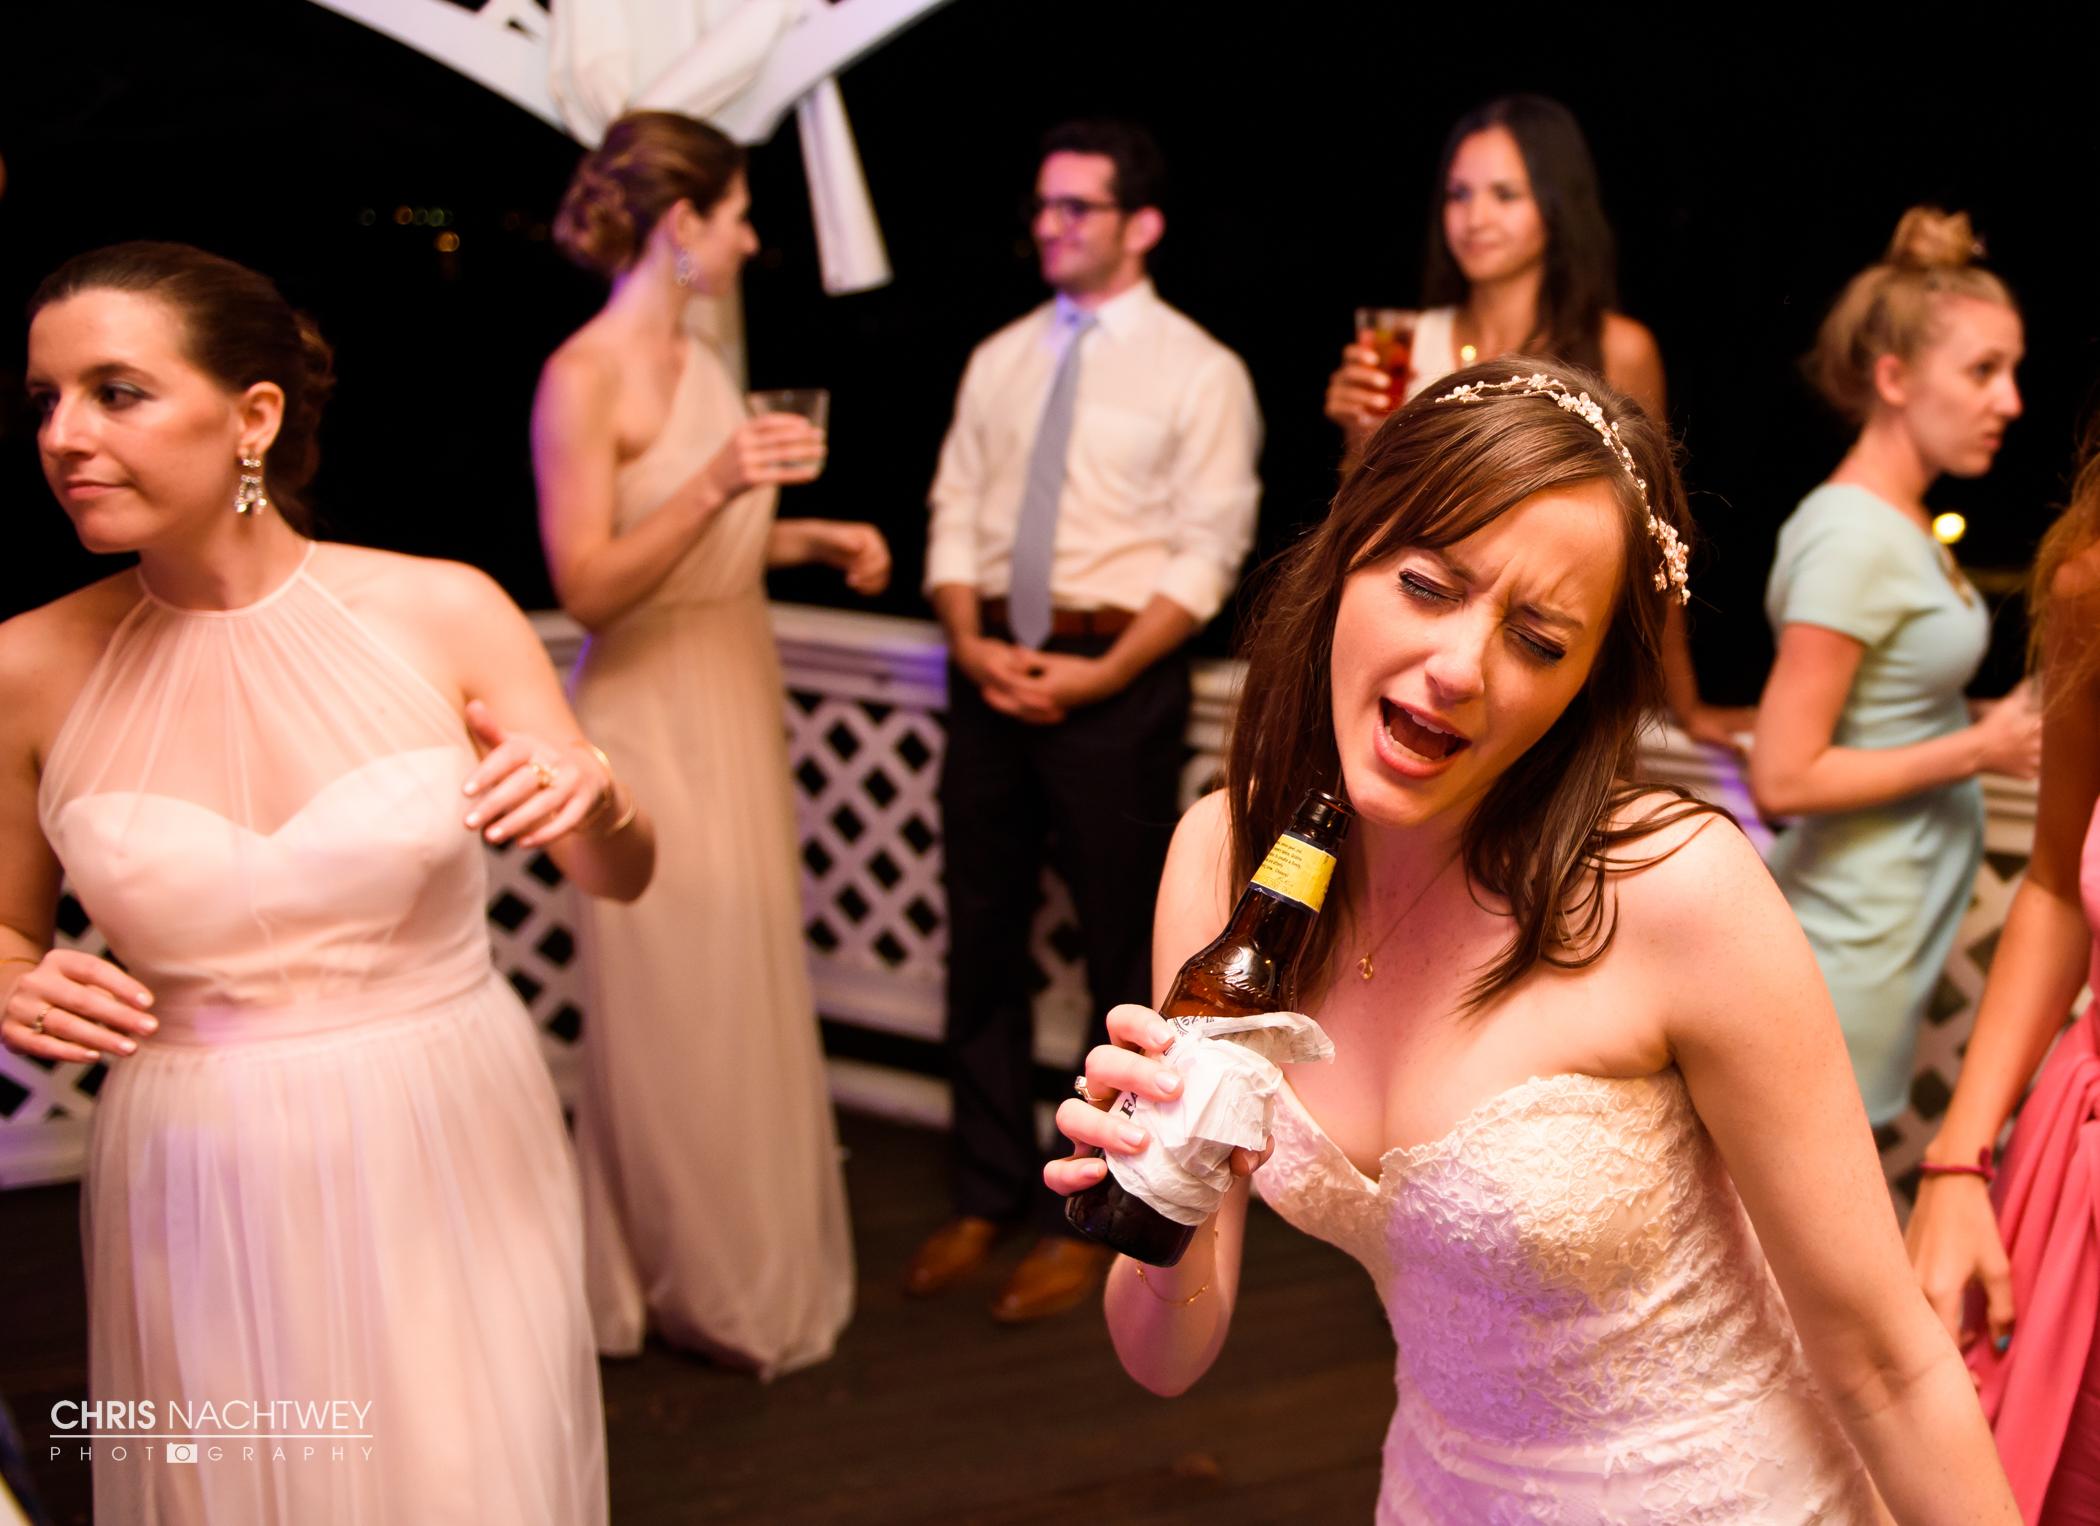 inn-at-mystic-connecticut-wedding-photographer-chris-nachtwey-31.jpg